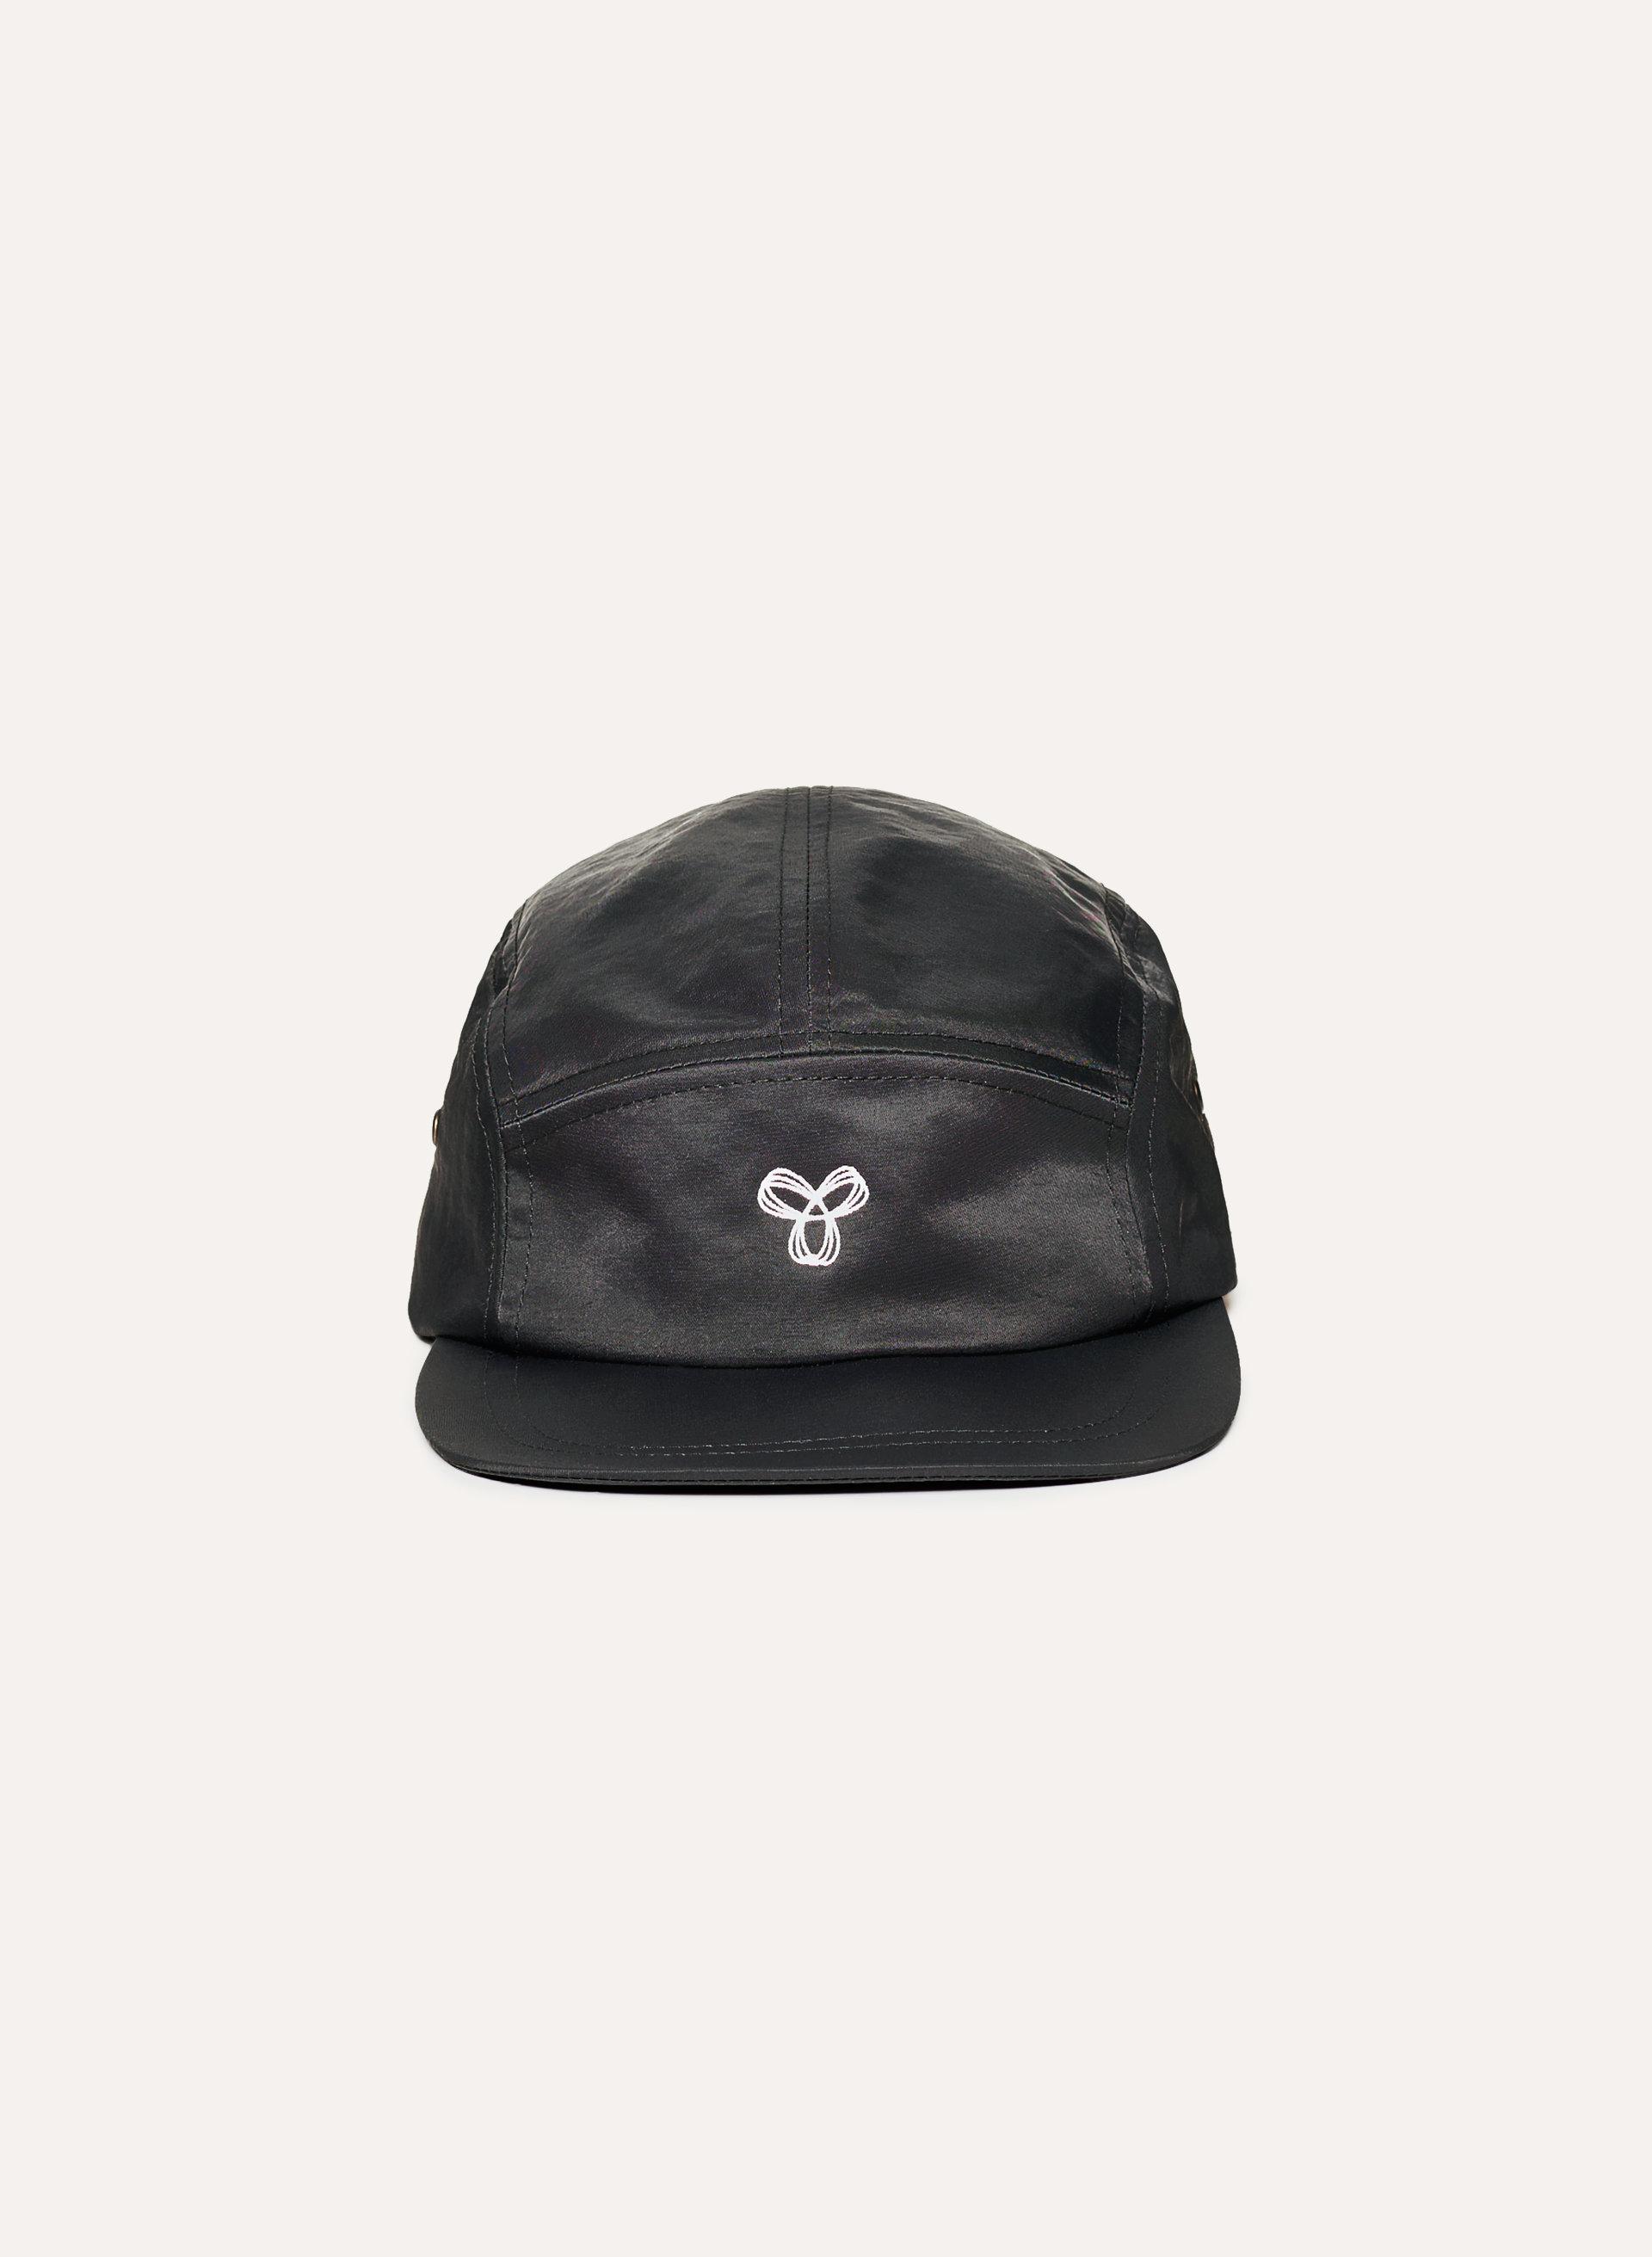 0d1489890ac76 ... Tna SILVERTIP CAMP HAT